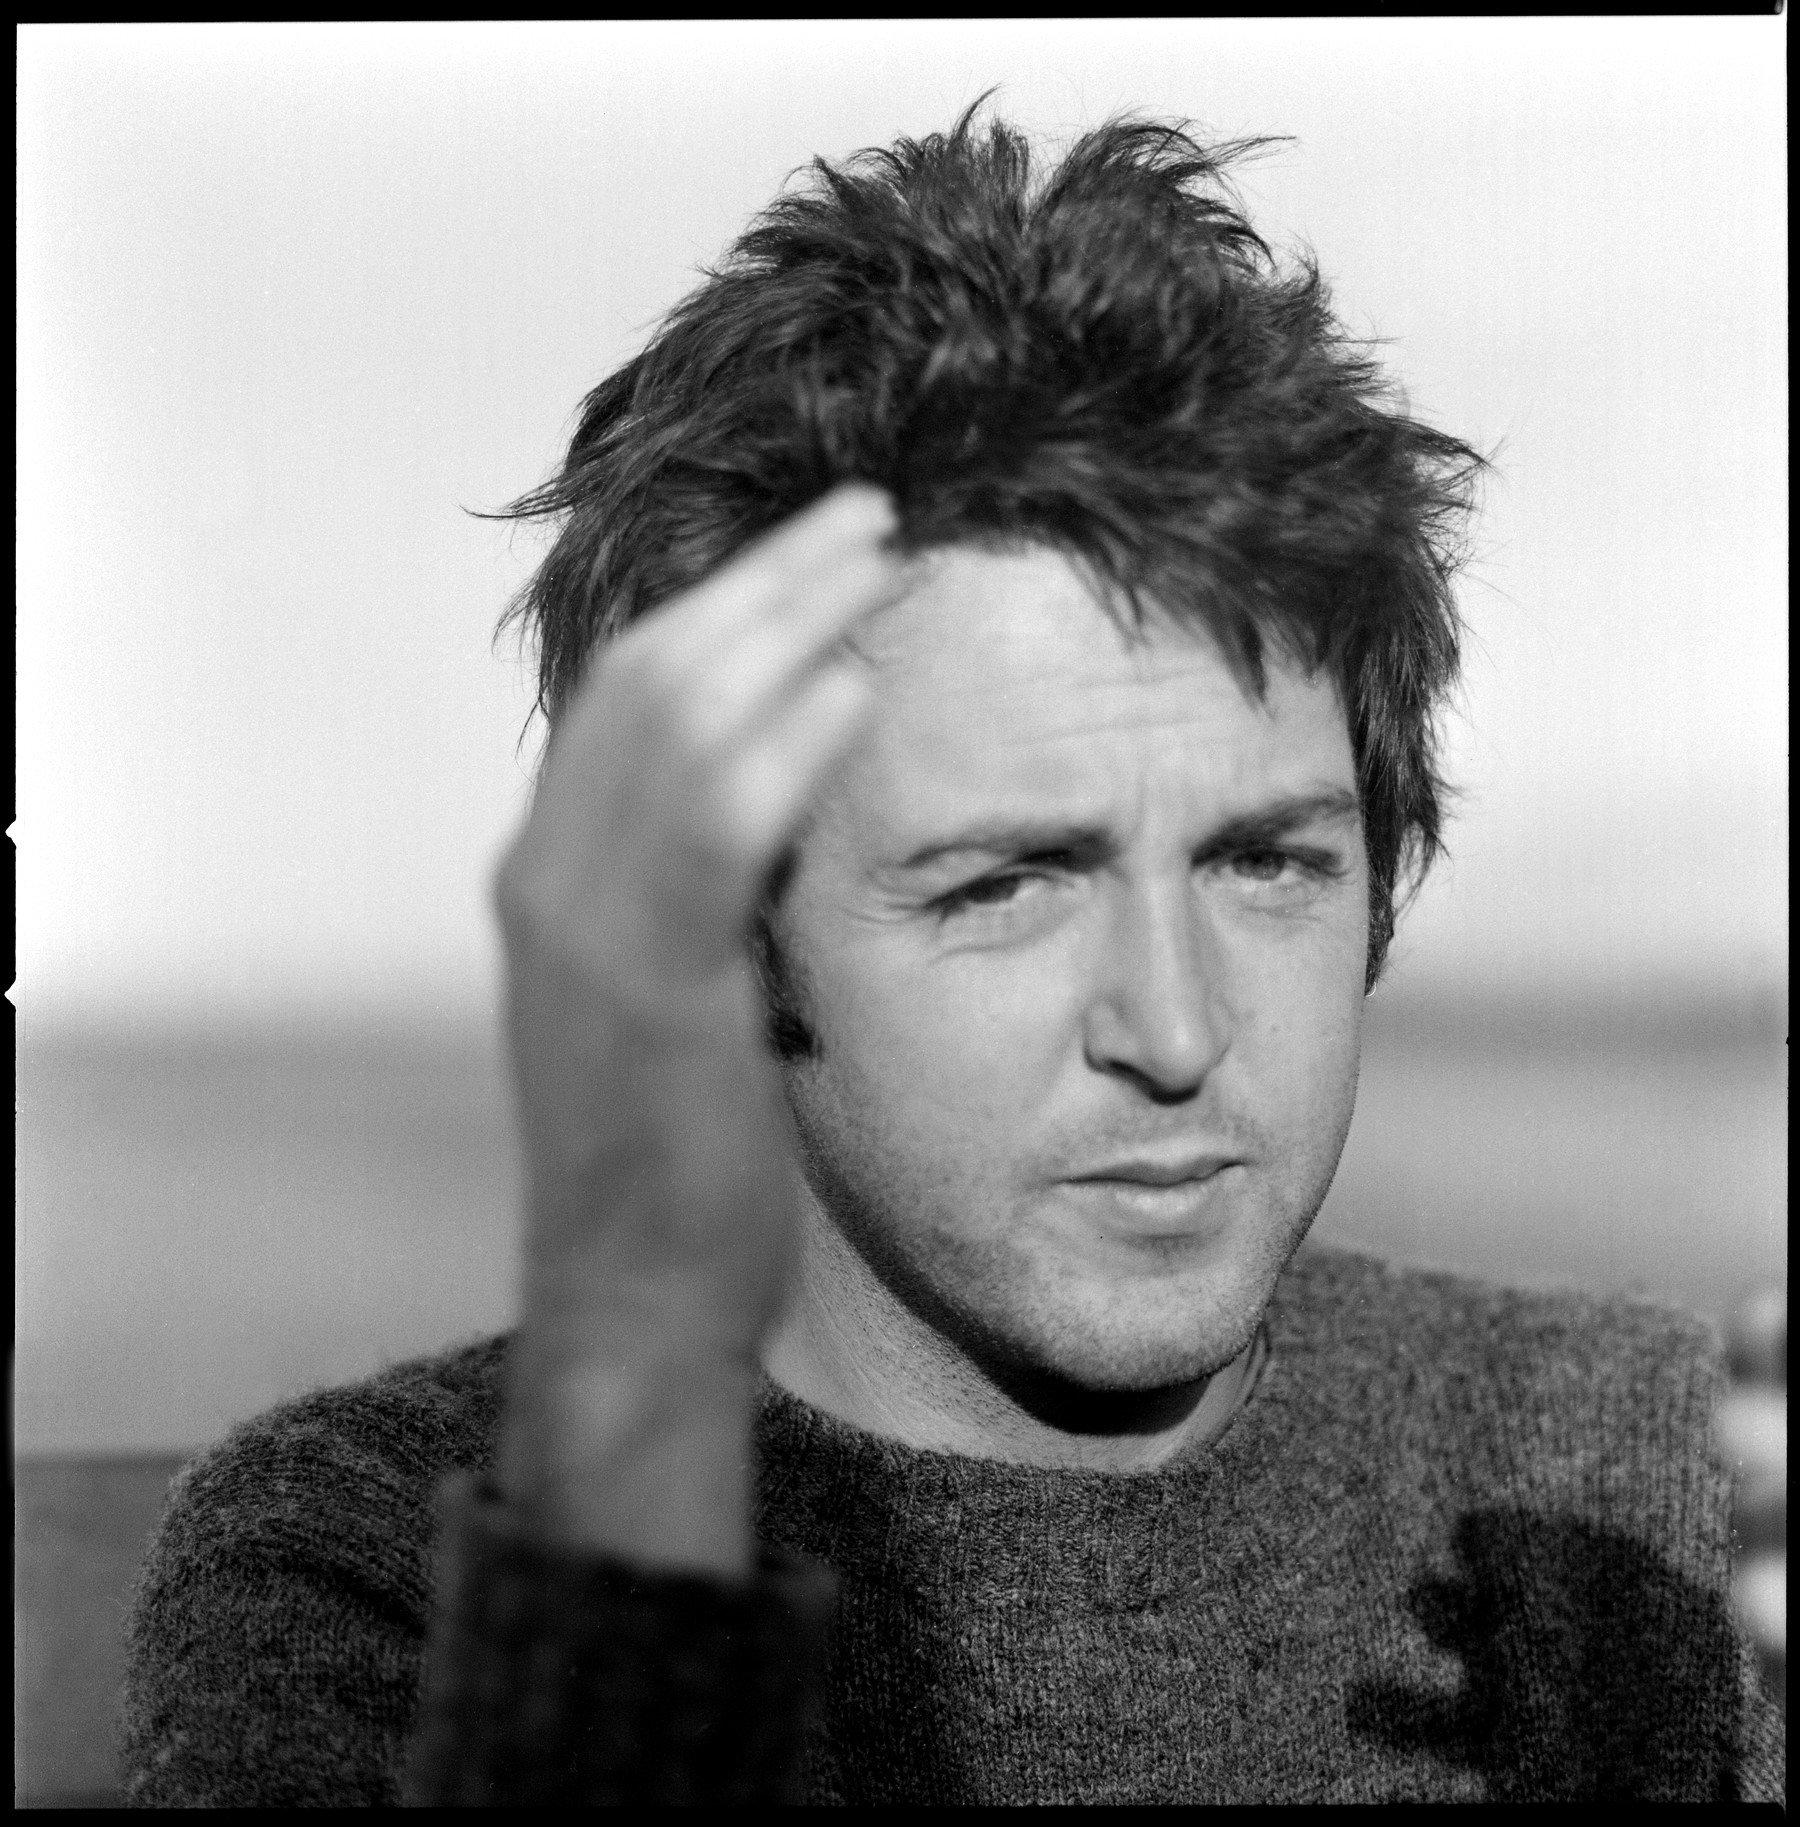 Photo of Paul in Scotland, by Linda McCartney #ThrowbackThursday #TBT #PureMcCartney https://t.co/7X0eL0szWN